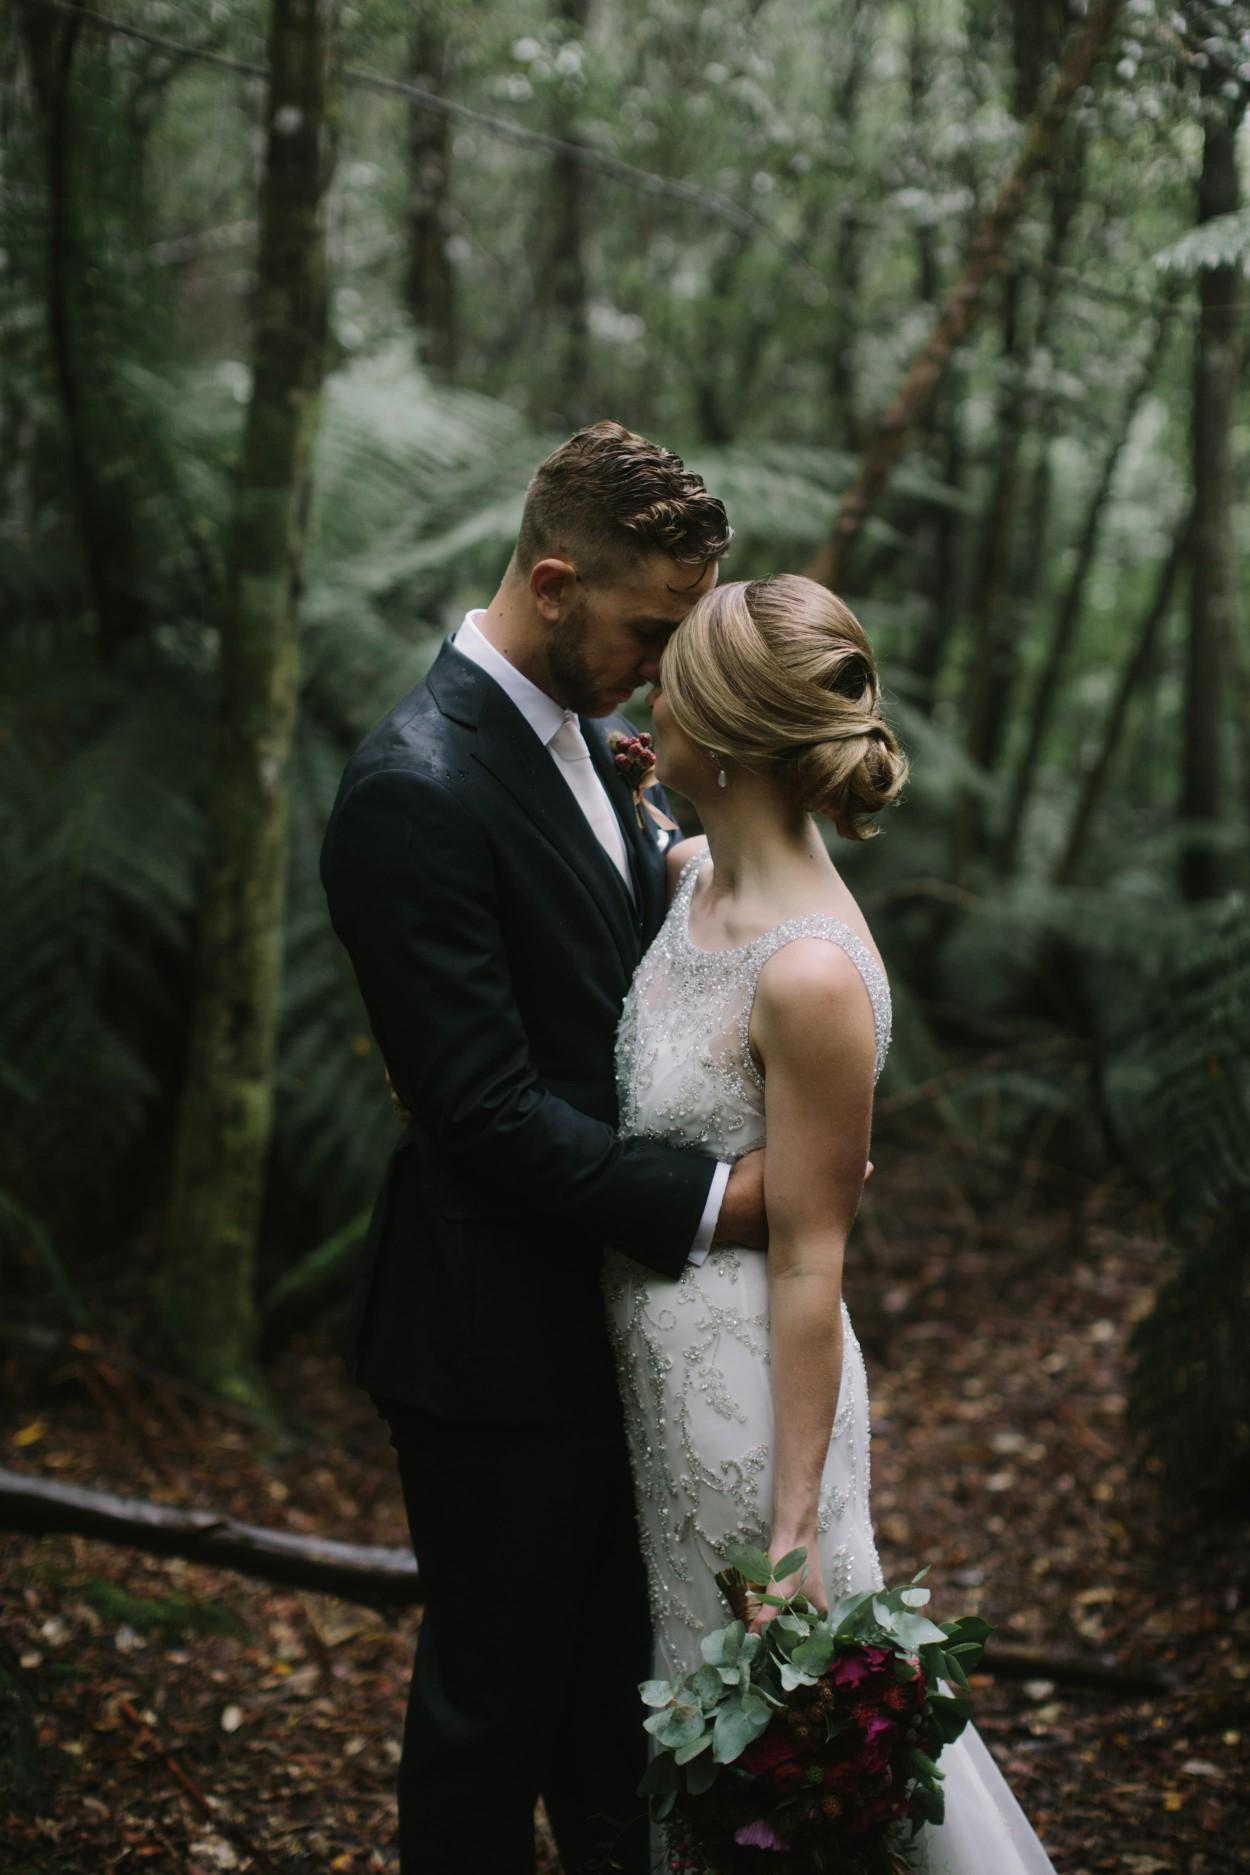 I-Got-You-Babe-&-Co.-Wedding-Photographers-Cassie014.jpg